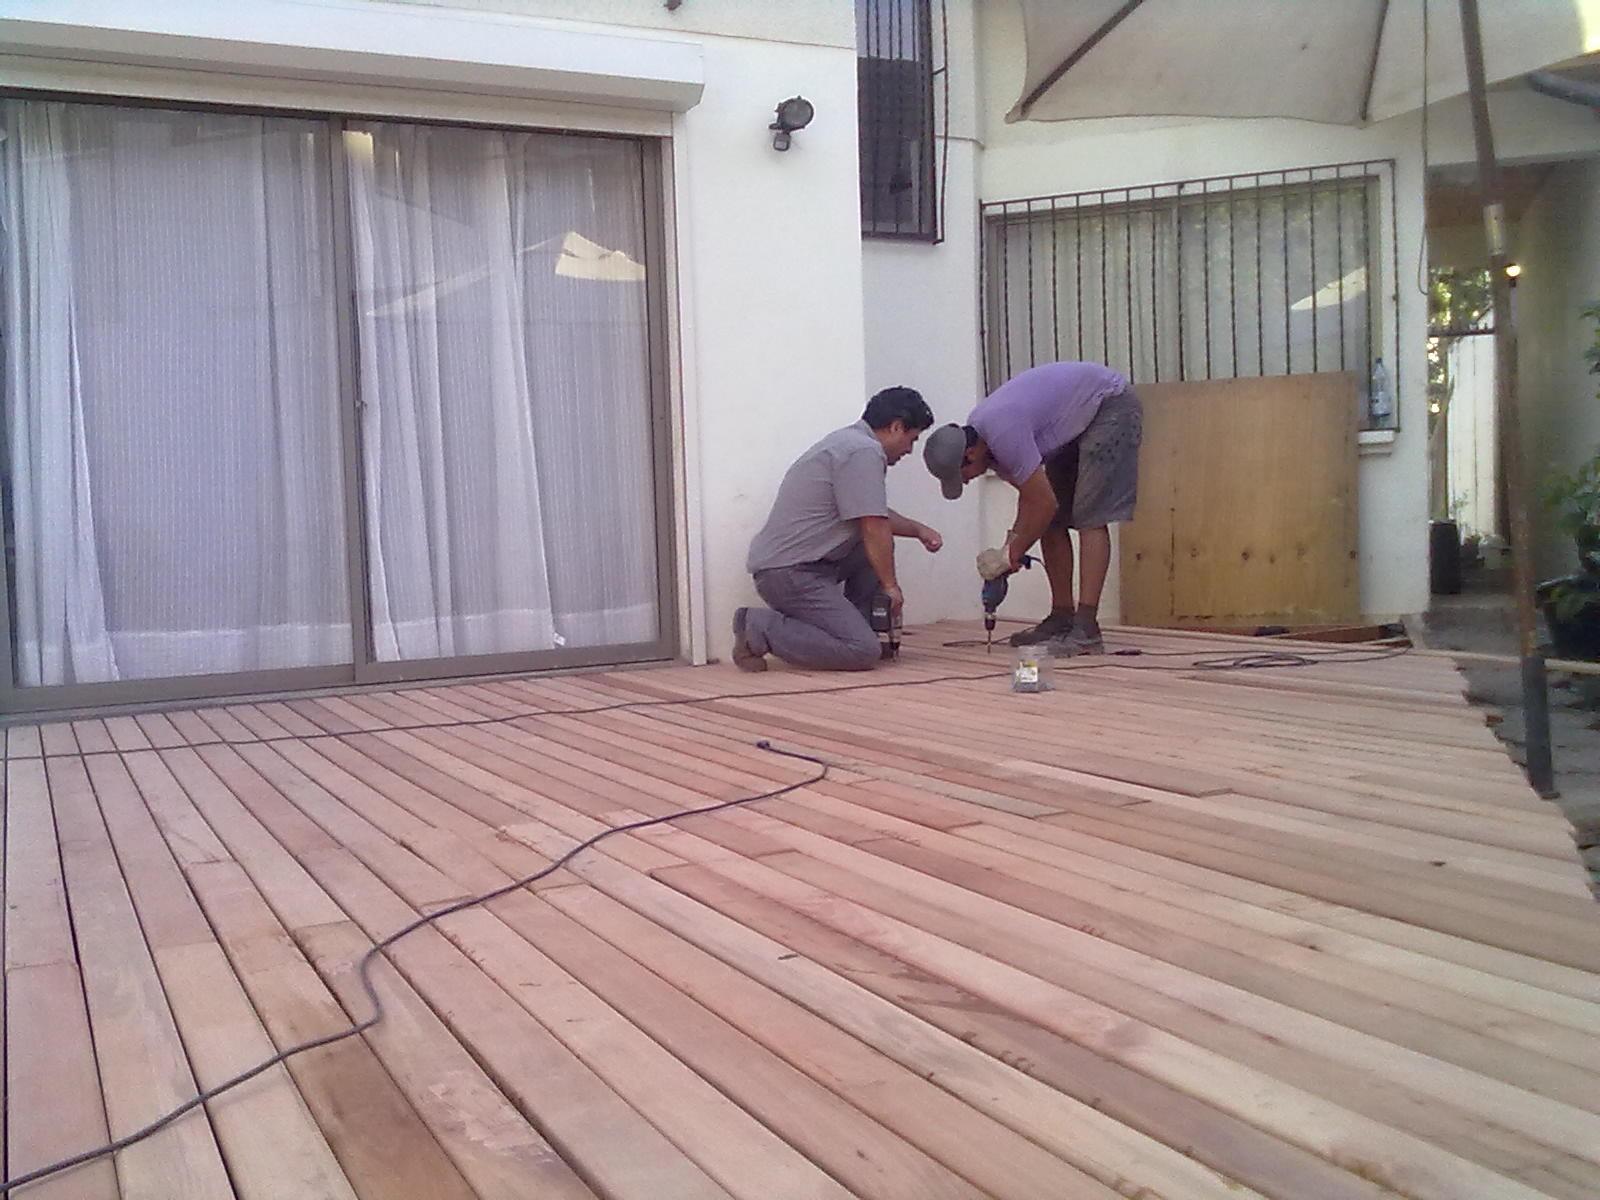 Puertas japonesas deck pisos de madera terrazas for Pisos de terrazas